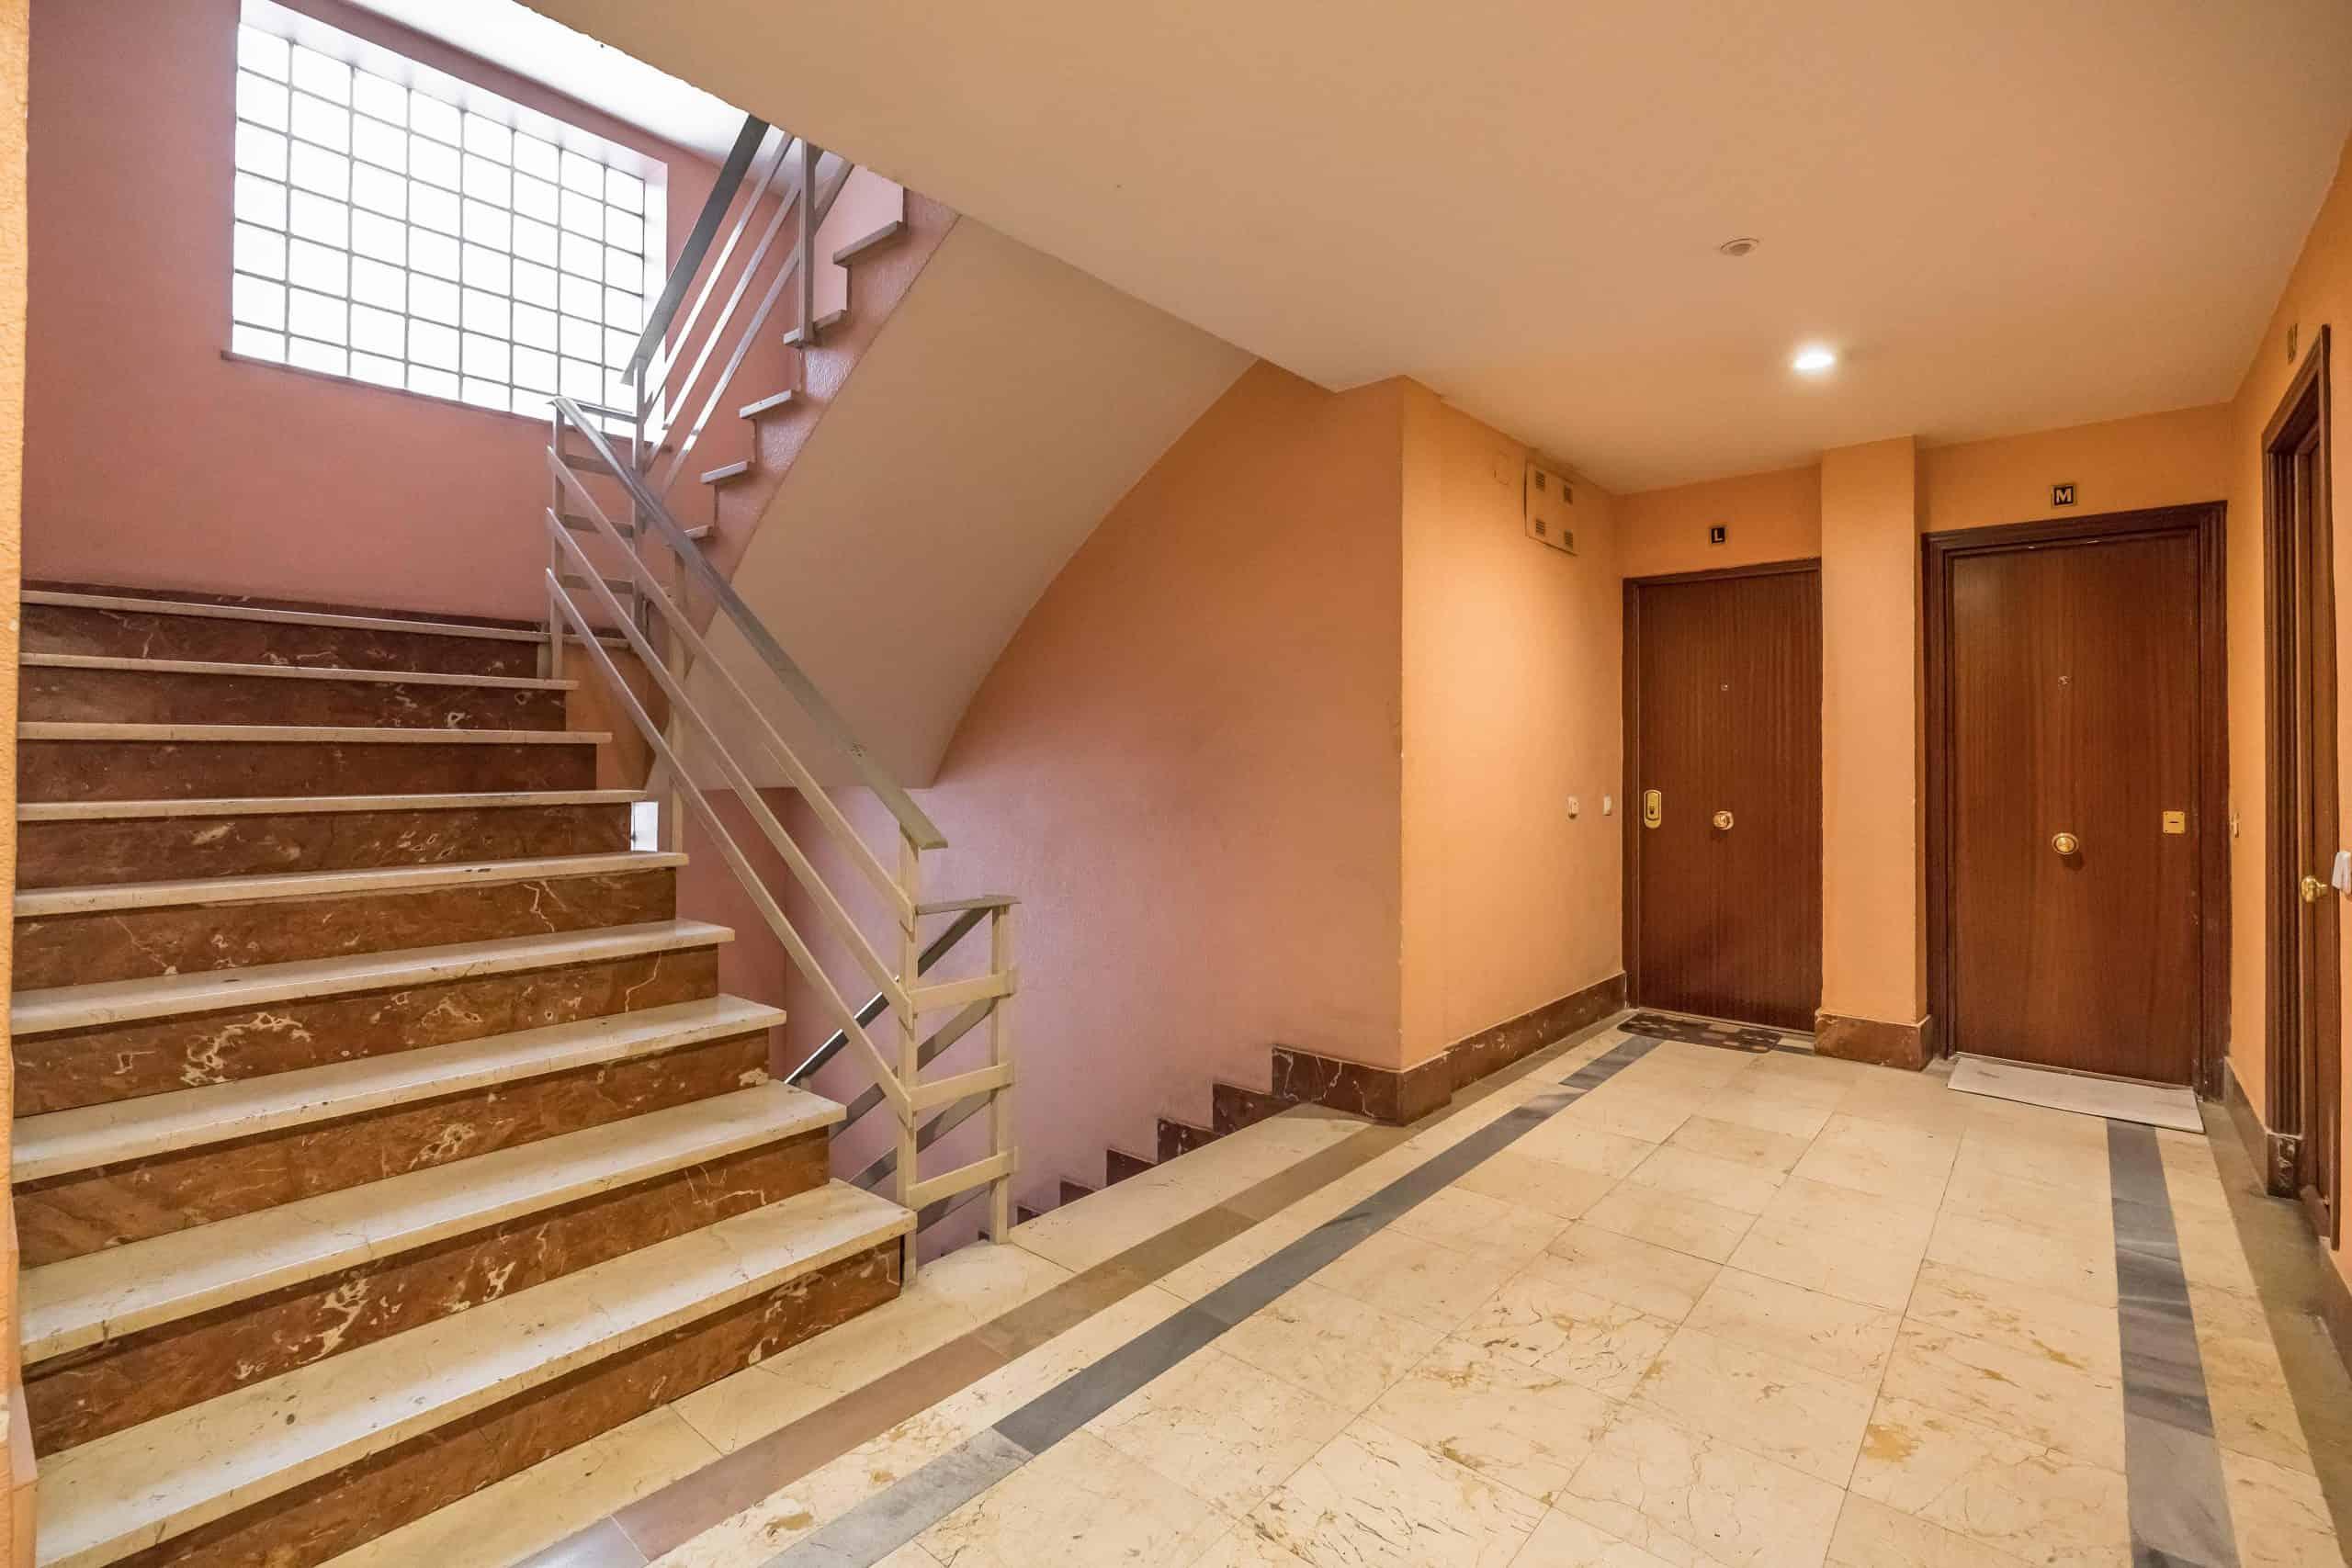 Agencia Inmobiliaria de Madrid-FUTUROCASA-Zona ARGANZUELA-LEGAZPI -calle Jaime Conquistador 48- Zonas Comunes 1